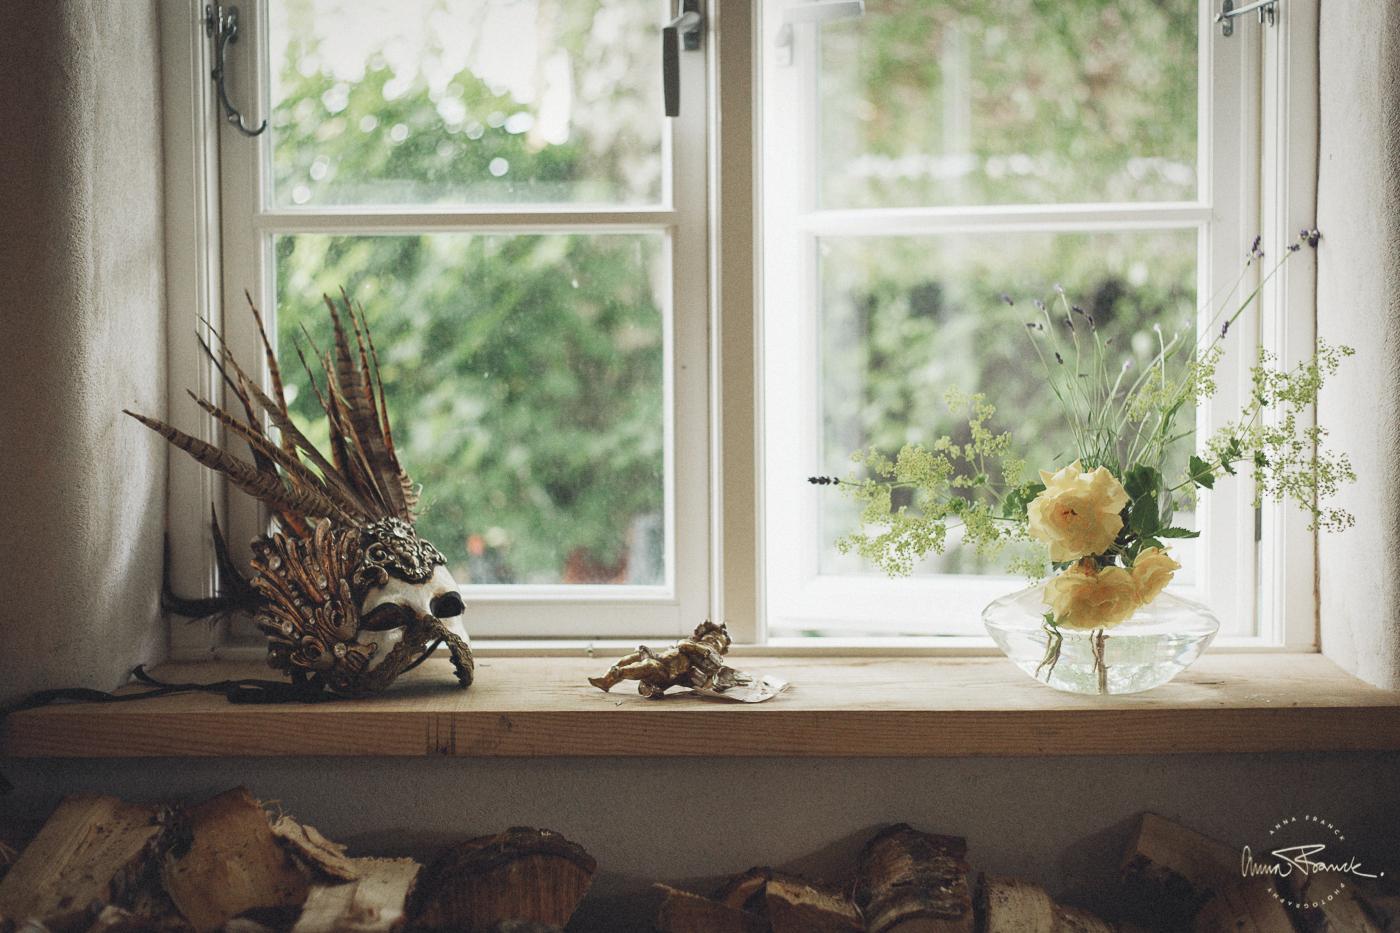 anna, franck, photography, onlocation, skåne, brösarp, home, design, decorating, interior, details, flowers, rural, house, home, nordic, artistic, bohemian